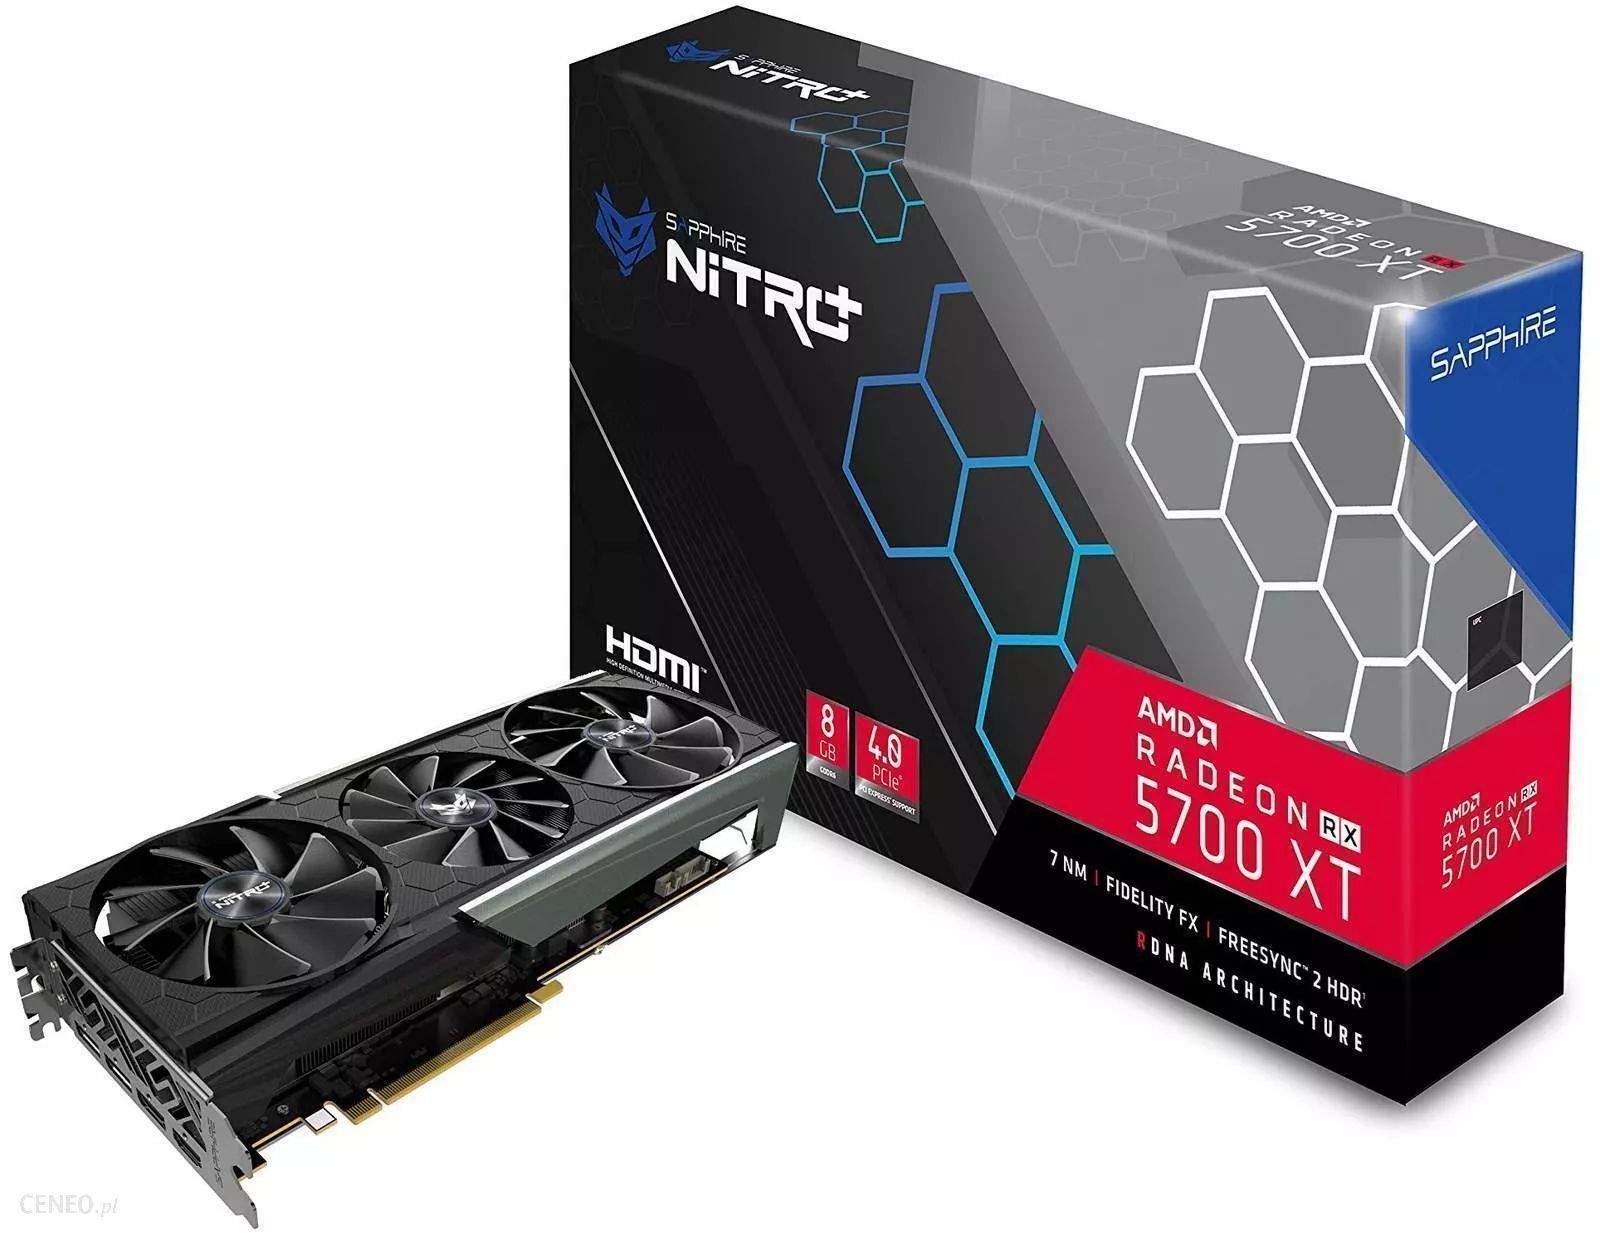 SAPPHIRE Nitro+ Radeon RX 5700 XT 8G 8192 MB GDDR6